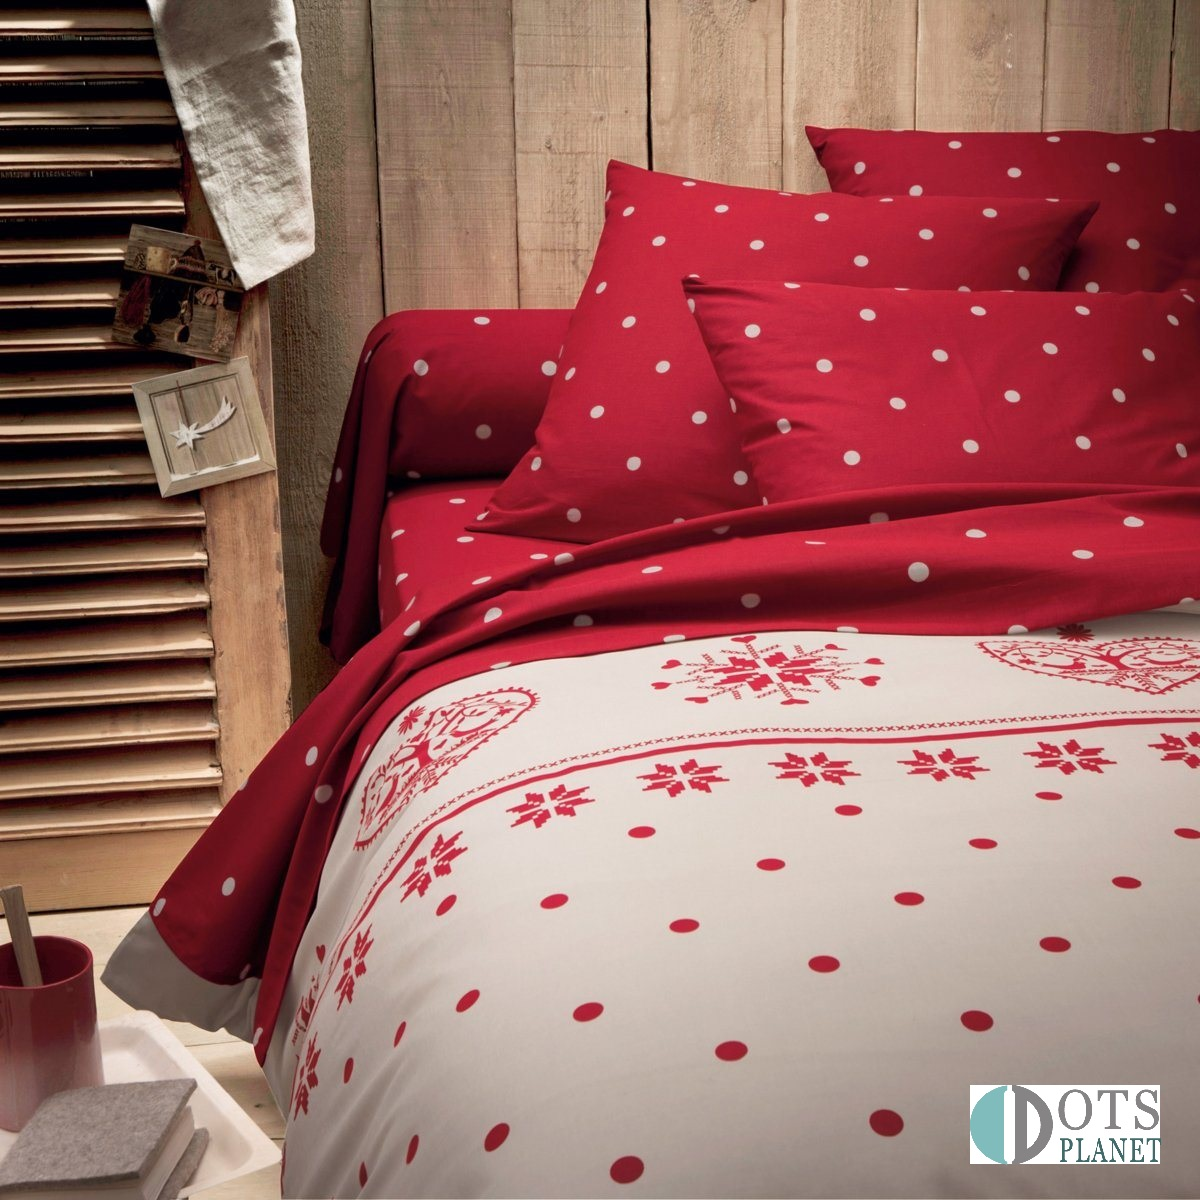 po ciel zimowa shabby chic 140x200. Black Bedroom Furniture Sets. Home Design Ideas